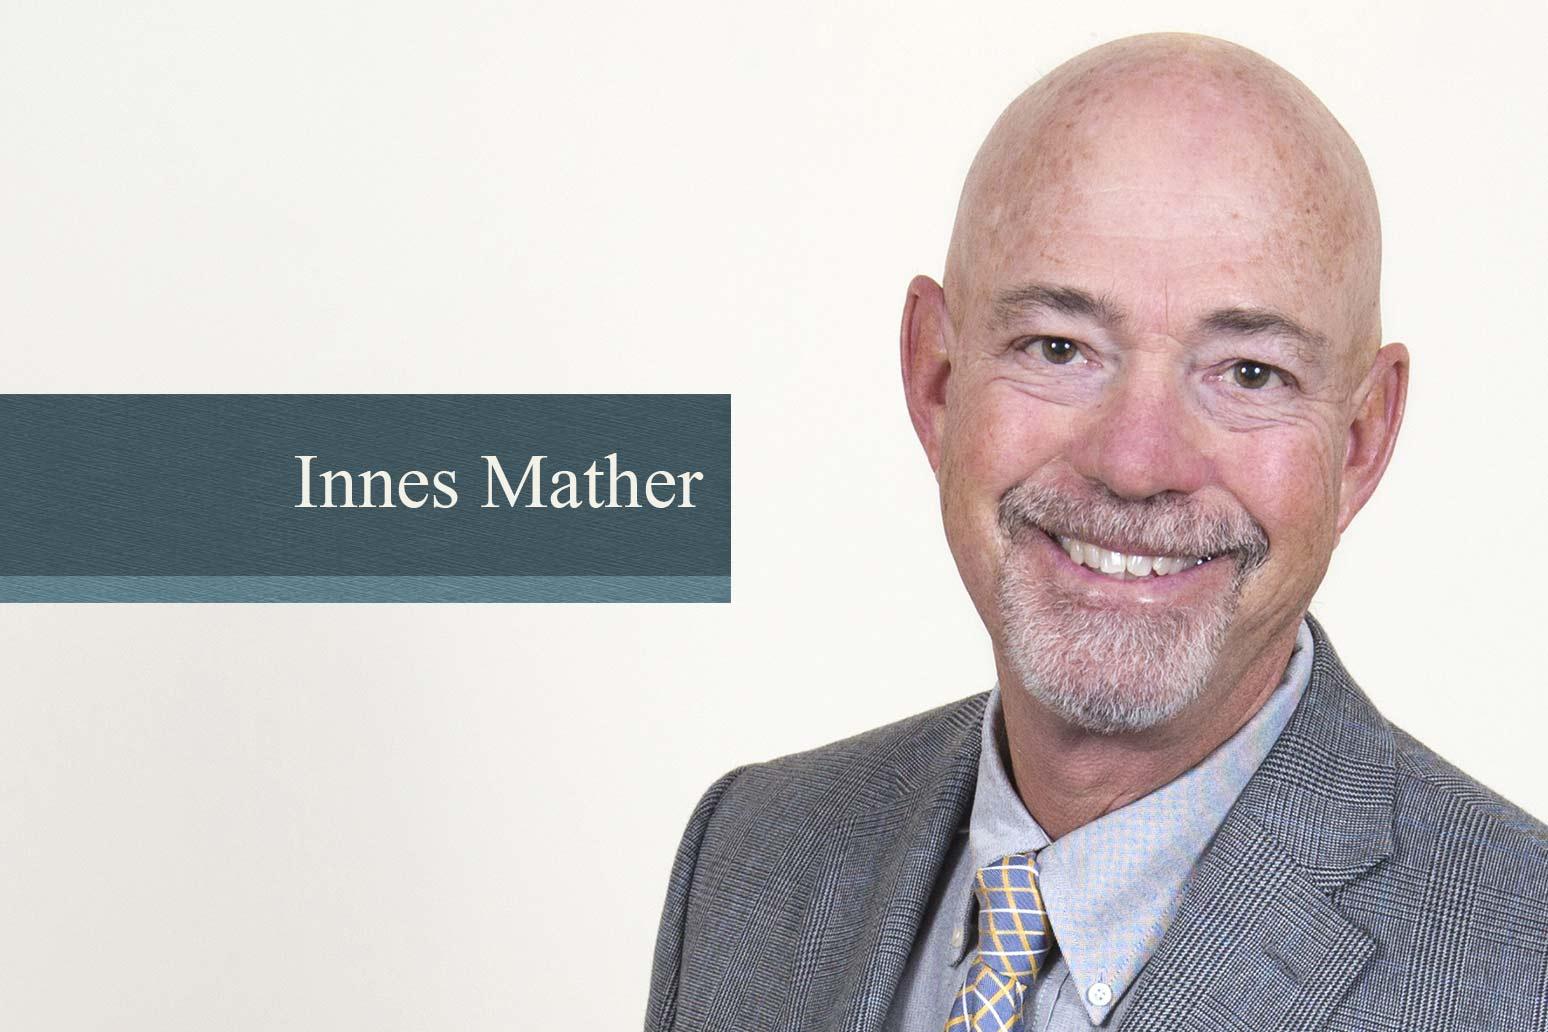 Innes-Mather